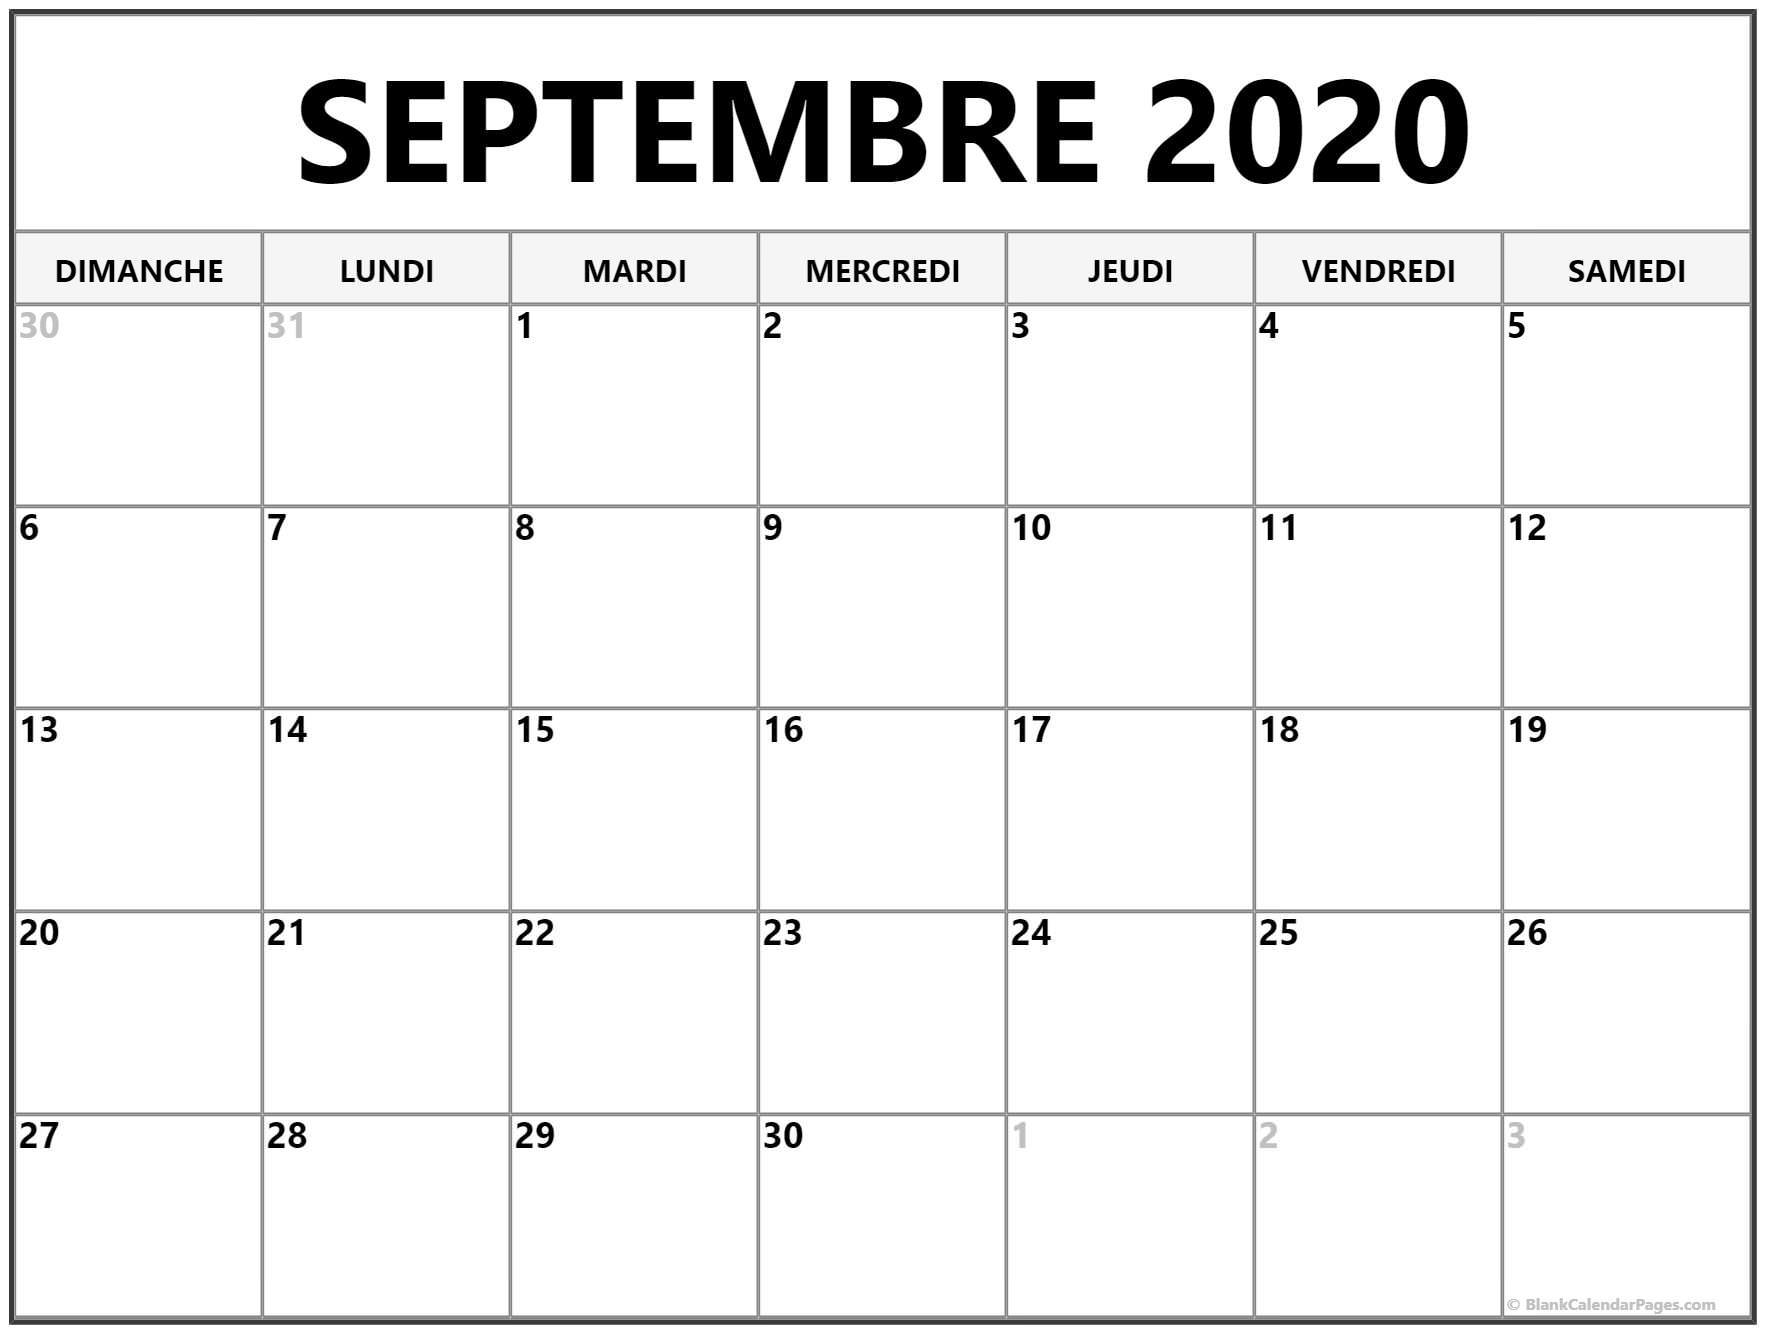 2020 Calendrier Septembre Vacances